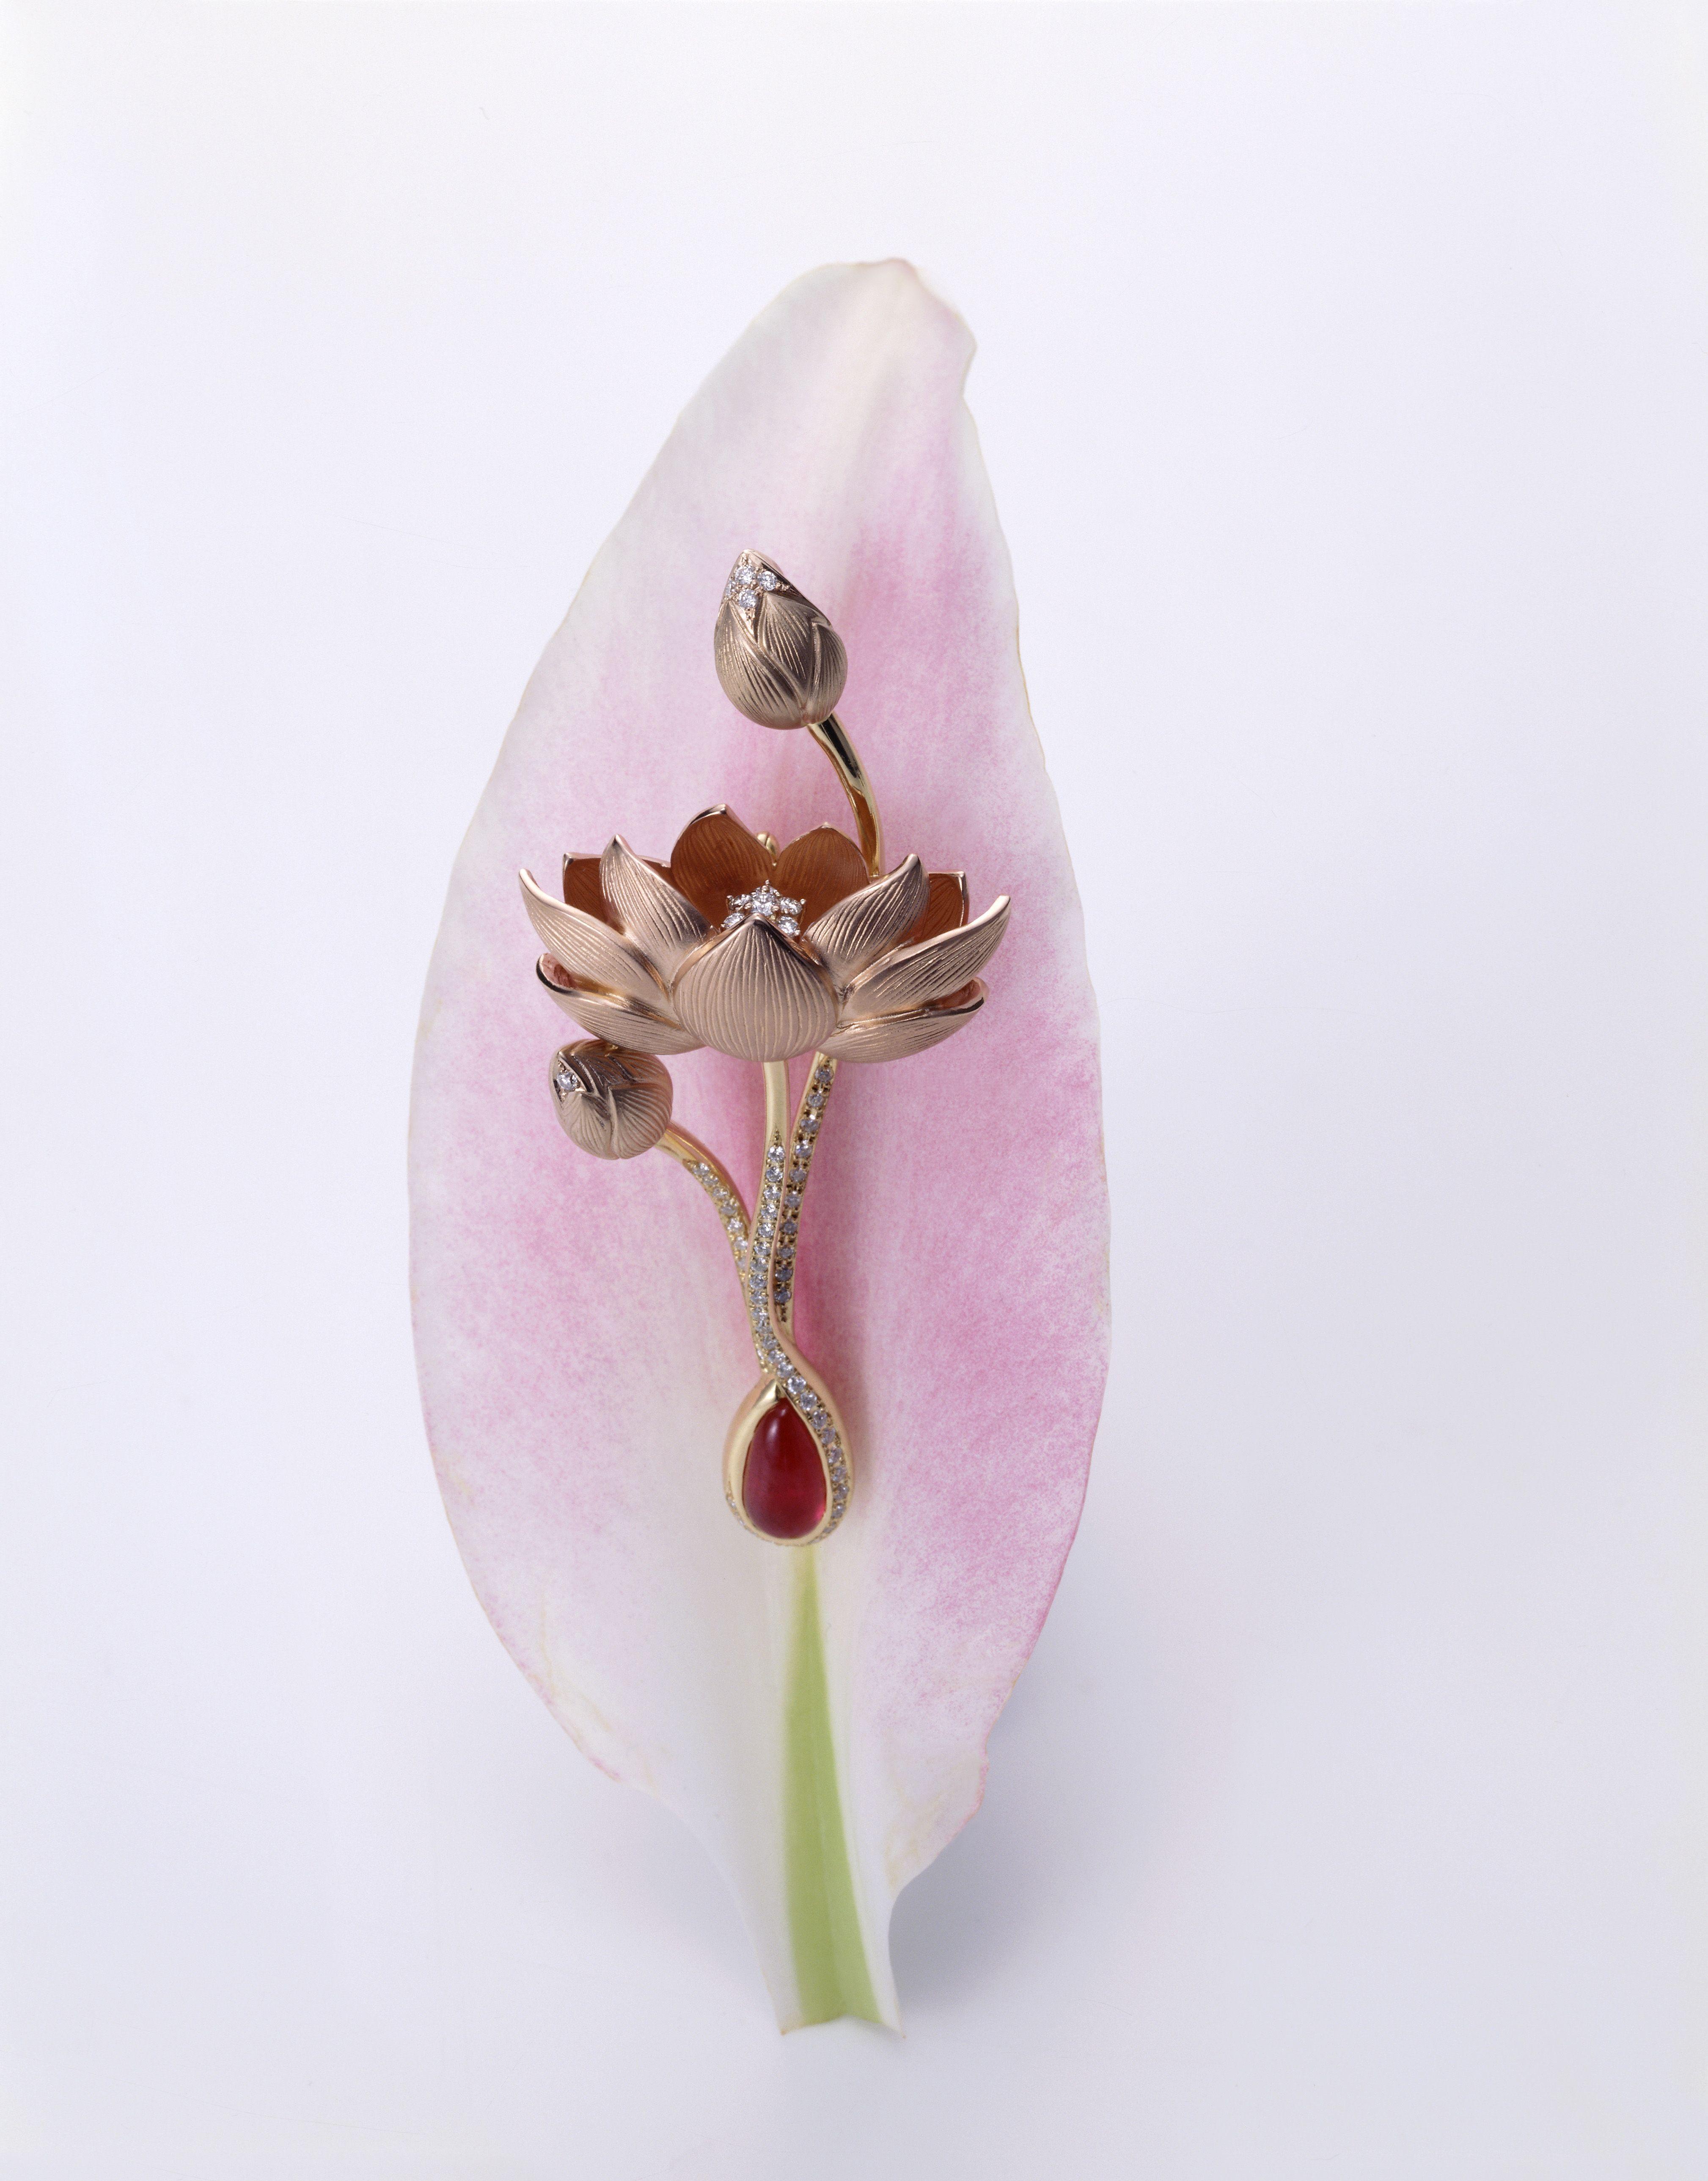 Broach with lotus flower motif k uno jewellery pinterest broach with lotus flower motif mightylinksfo